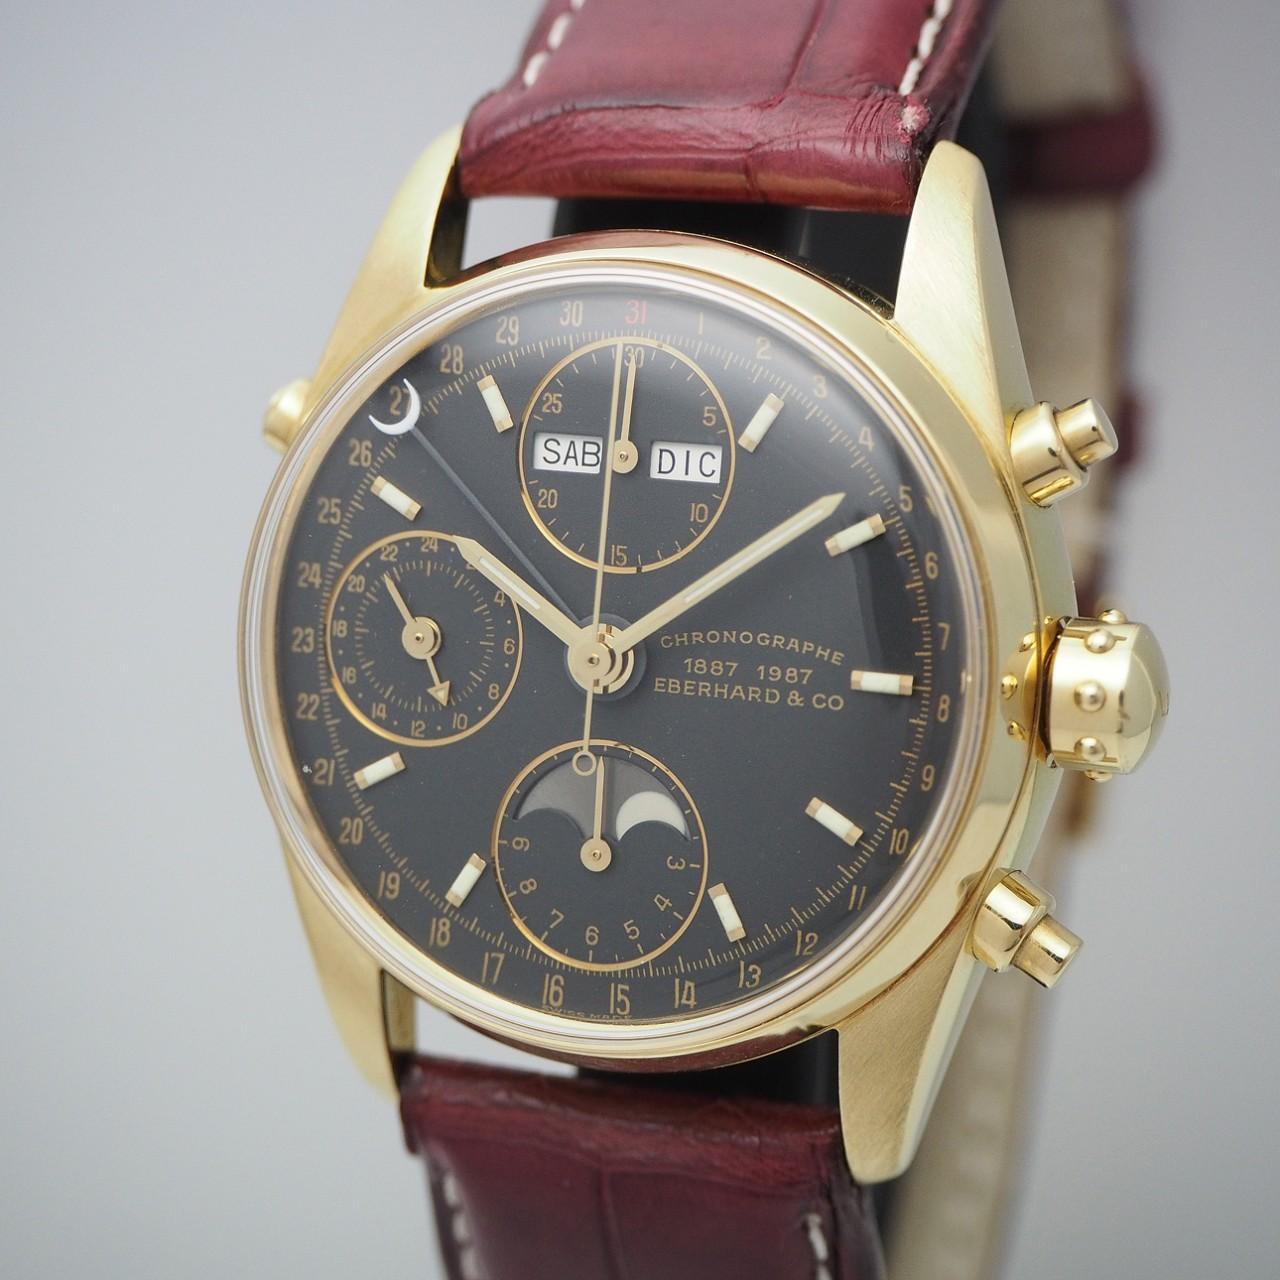 Eberhard & Co Navy Master Chronograph -Gold 18k/ 750